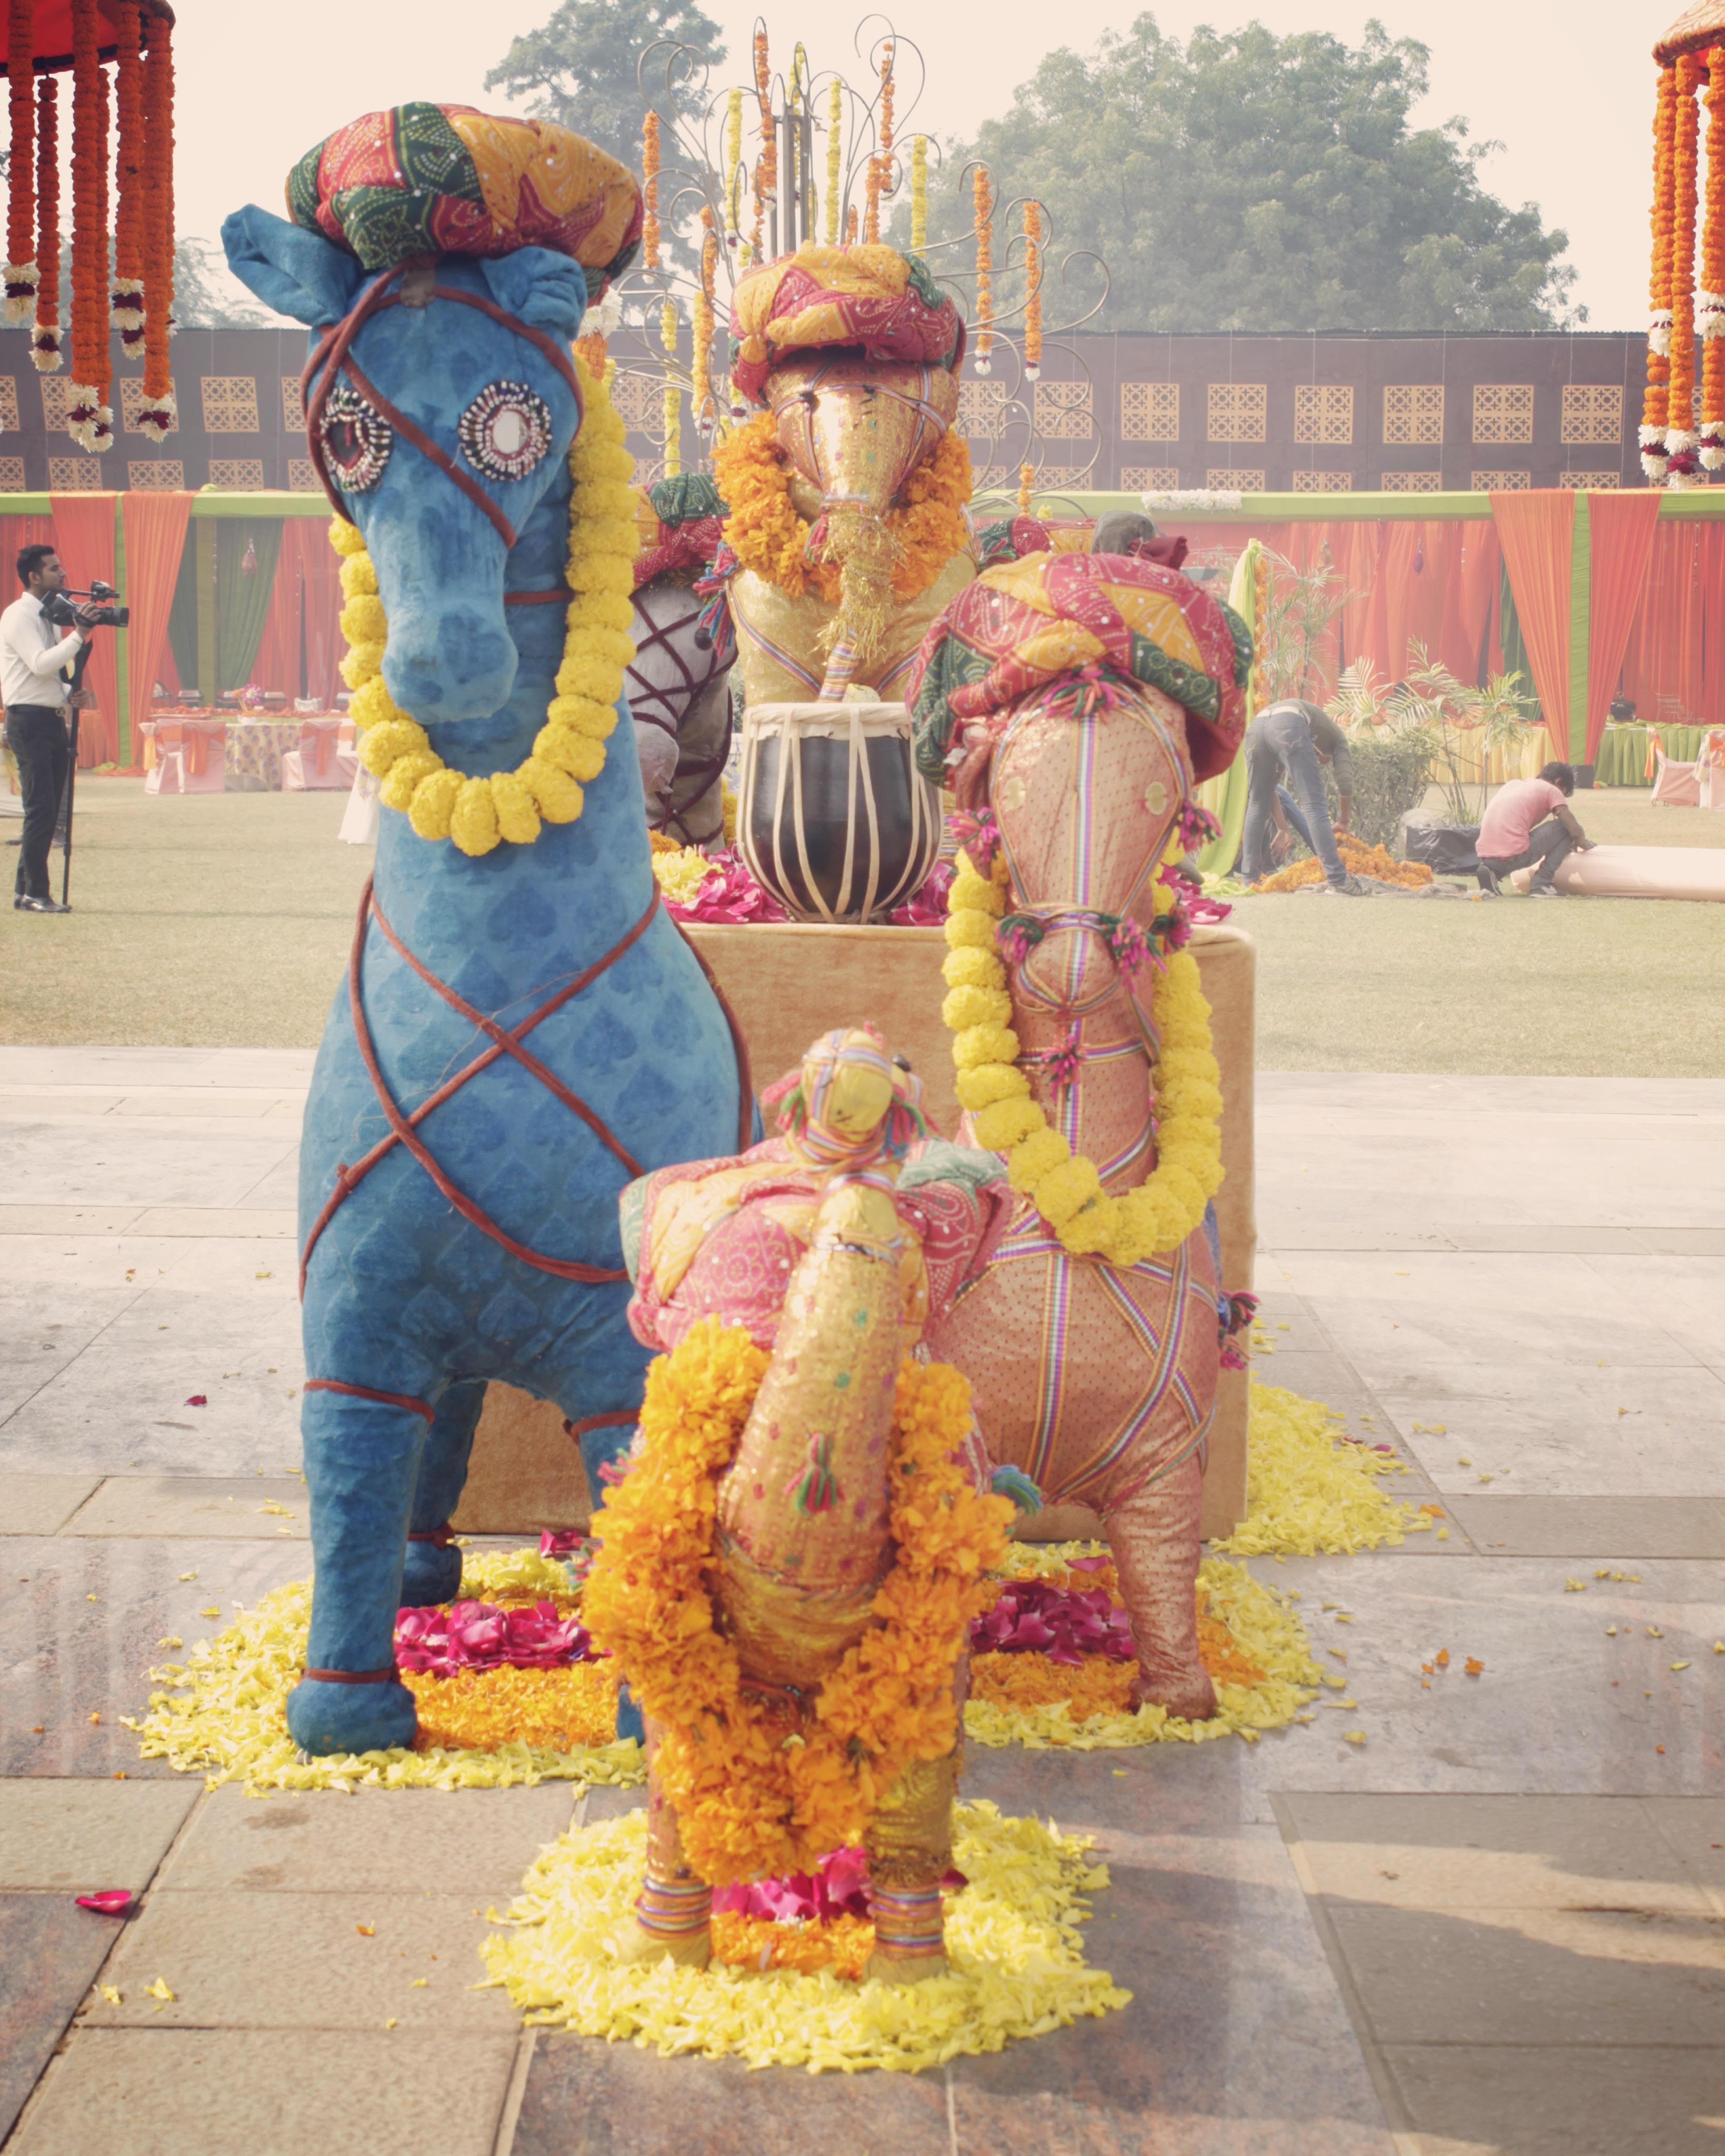 Delhi Mehendi by Elusive Dreams Features Unique Props, 4 Photo Ops, Lots Of Signage & More!